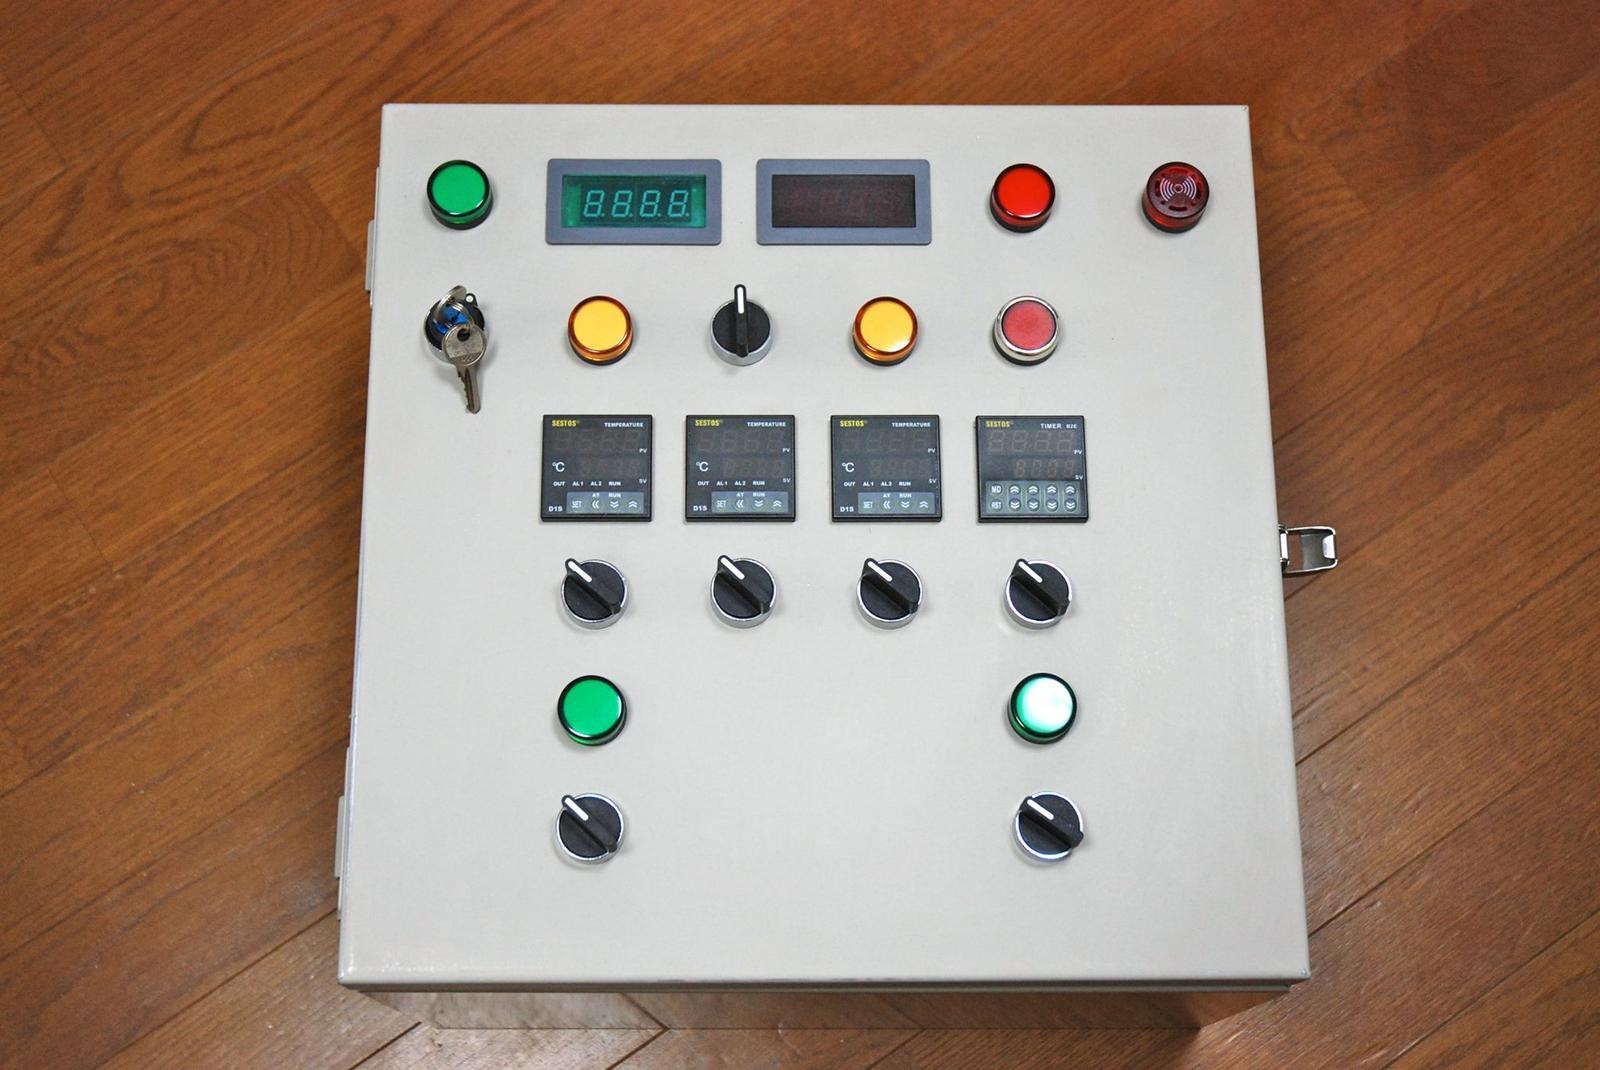 Sestos pids timer wiring advice homebrewtalk beer wine 1064474710152816833351873589584654558529456og swarovskicordoba Choice Image